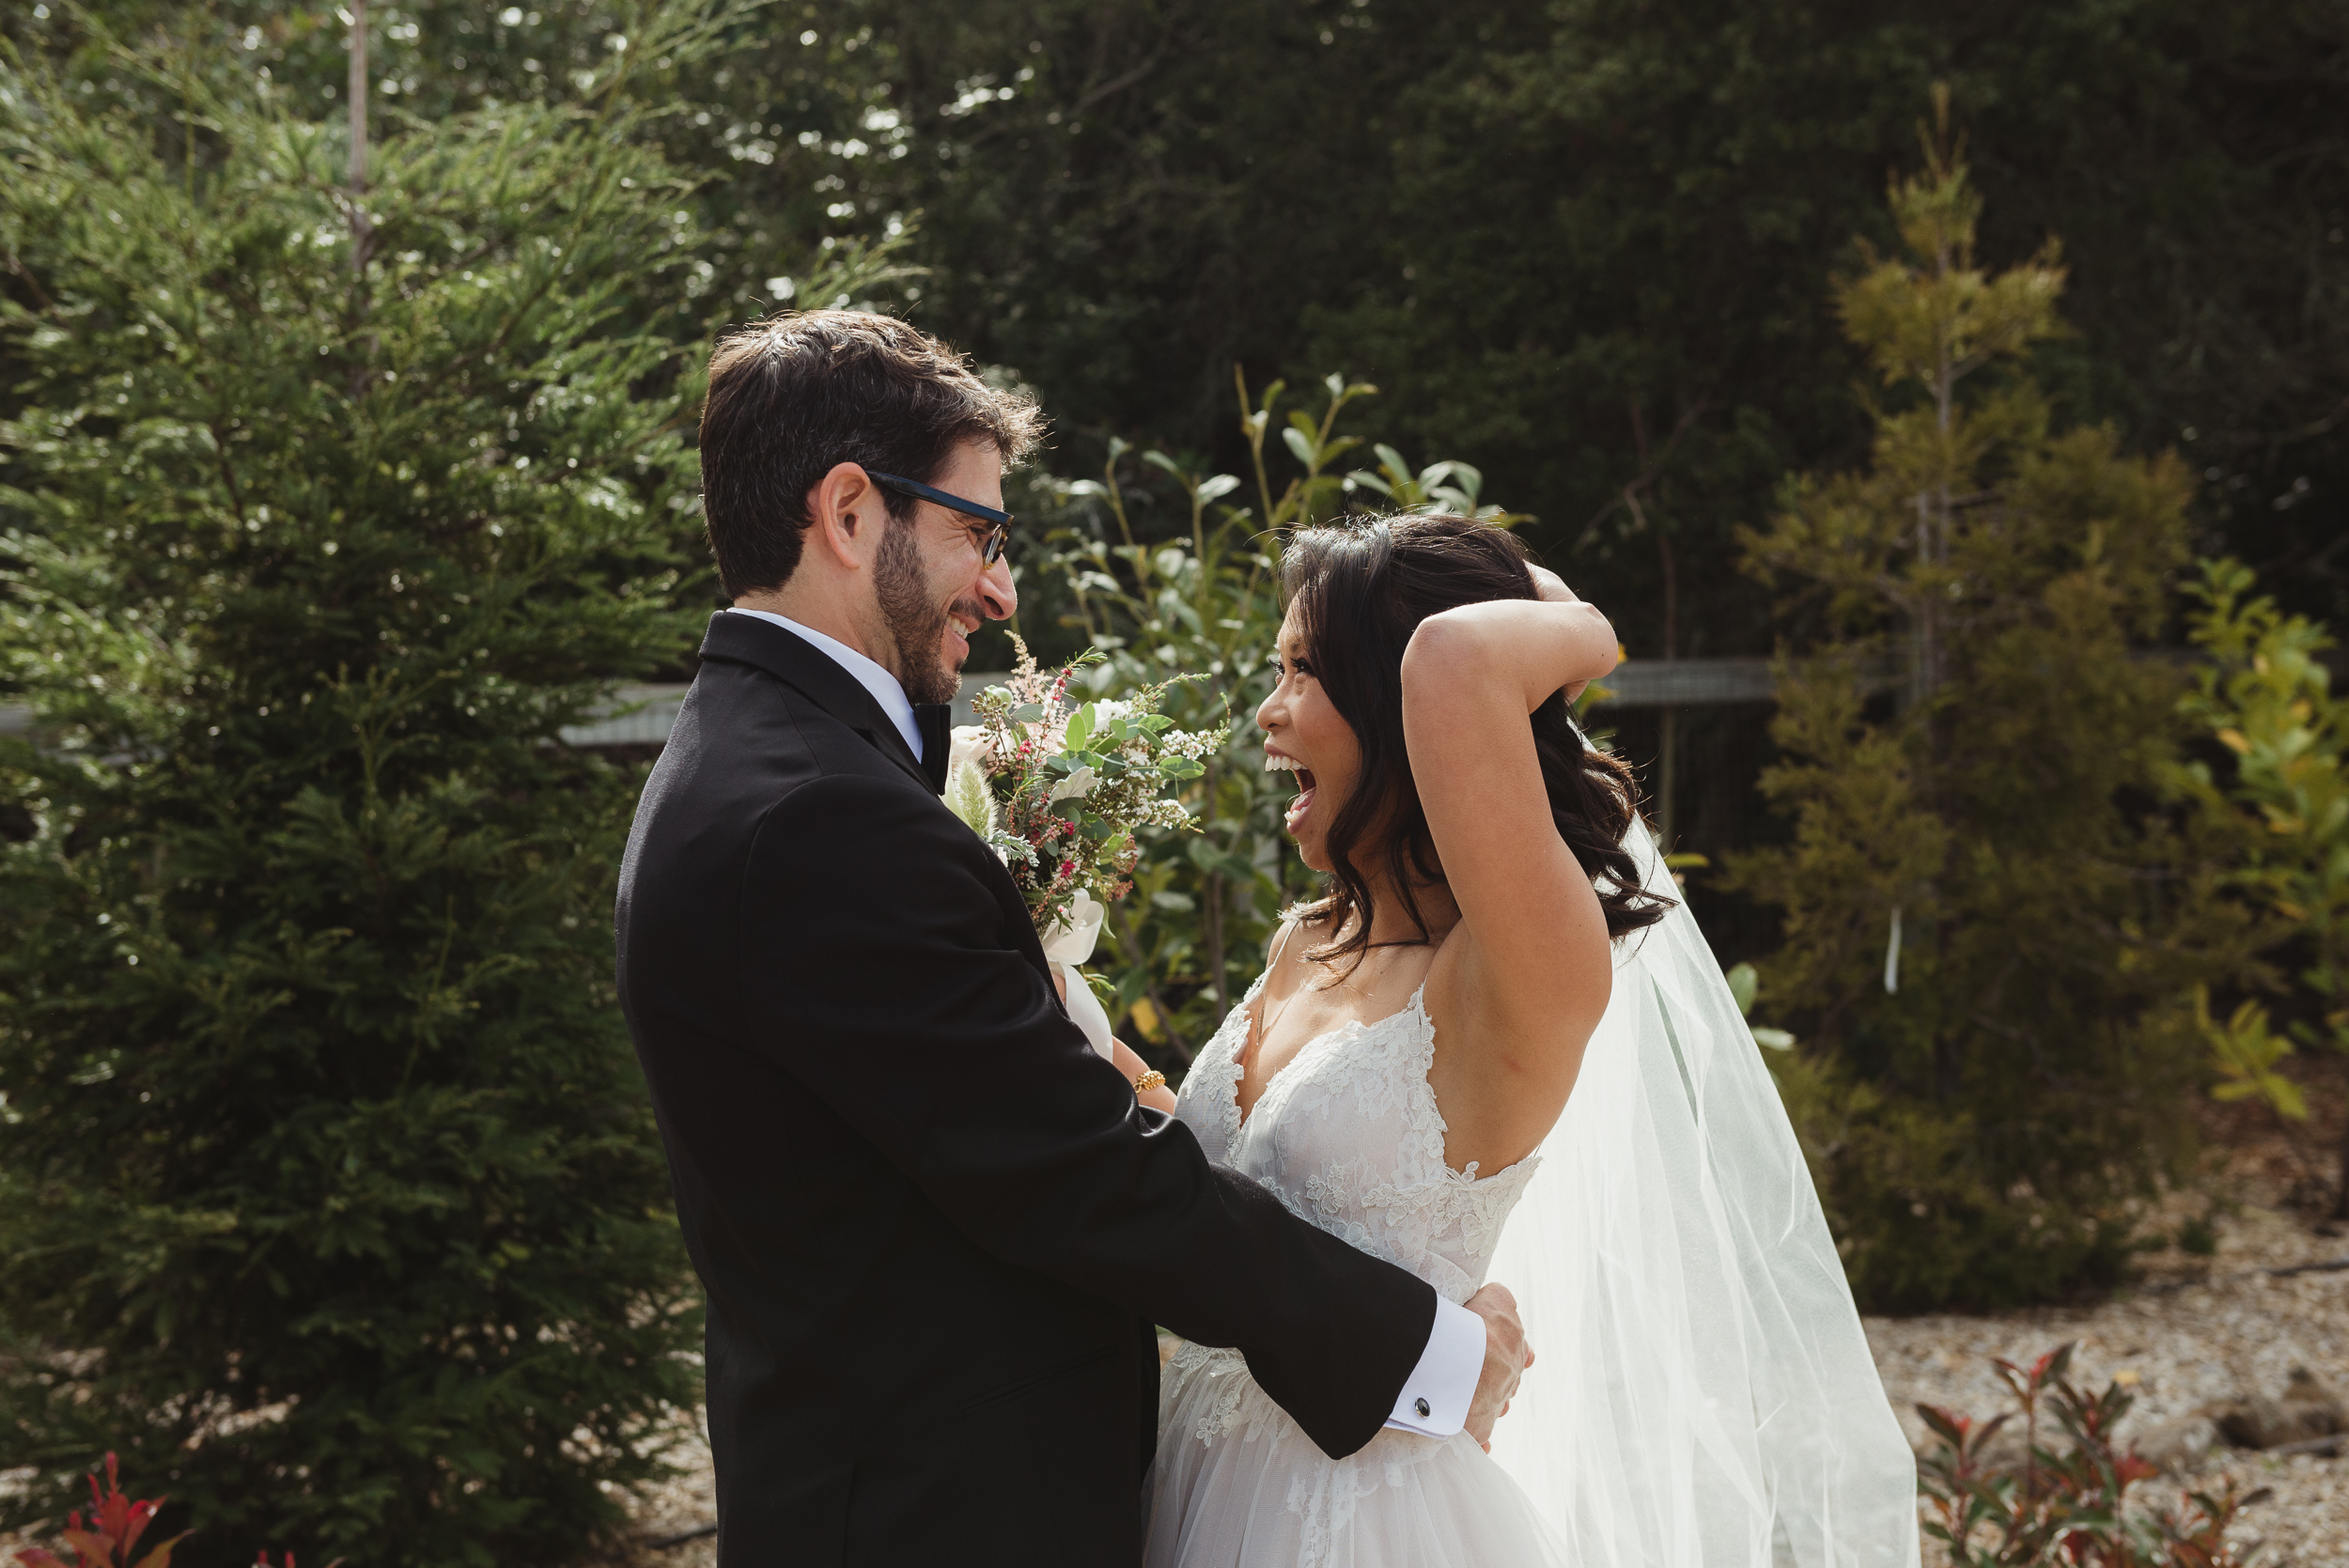 10-woodside-backyard-wedding-vivianchen-0113.jpg